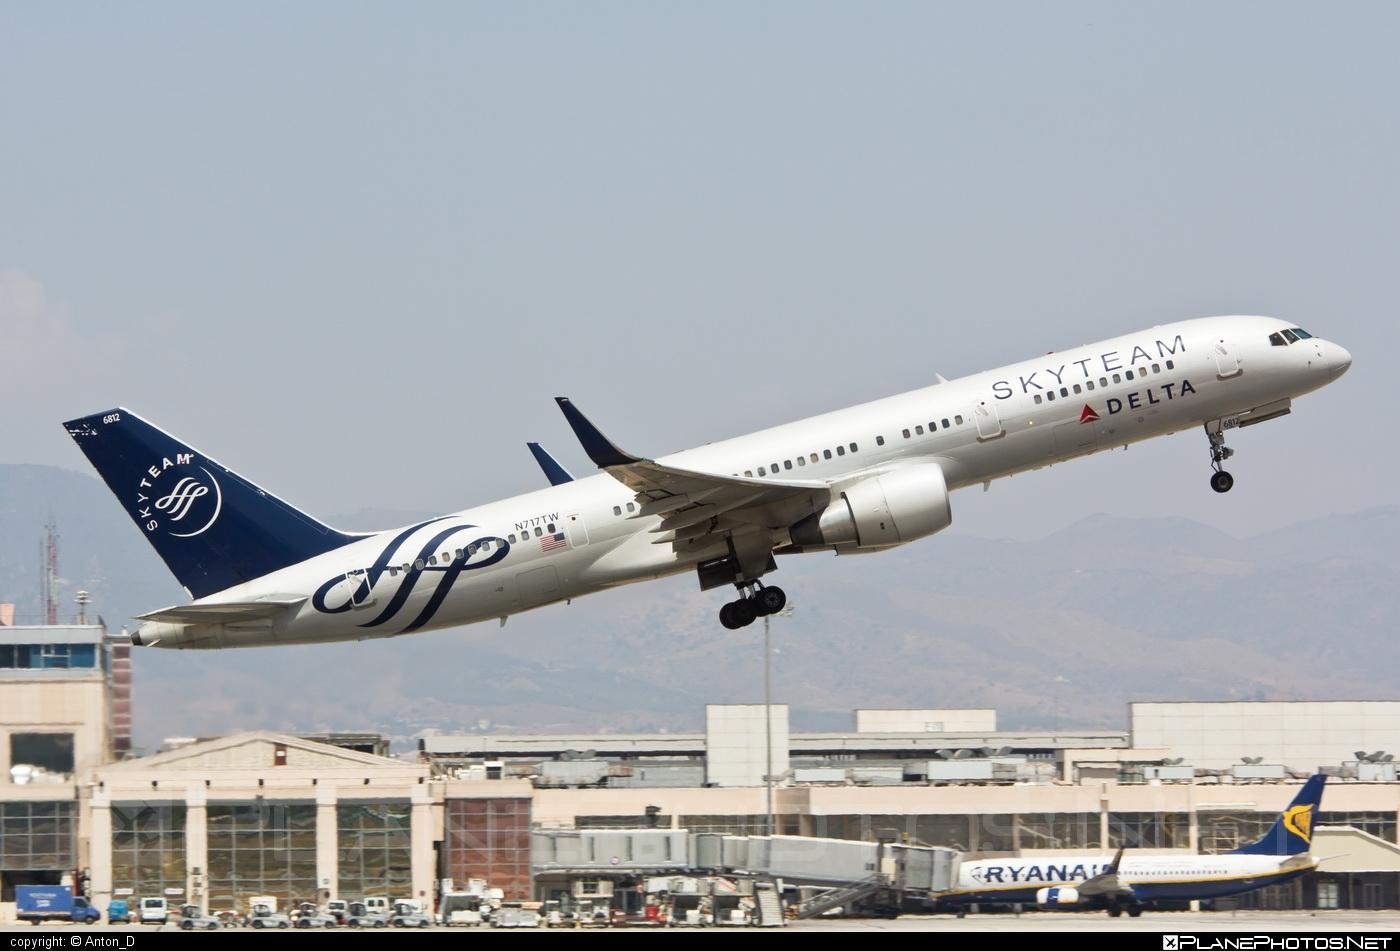 Boeing 757-200 - N717TW operated by Delta Air Lines #b757 #boeing #boeing757 #deltaairlines #skyteam